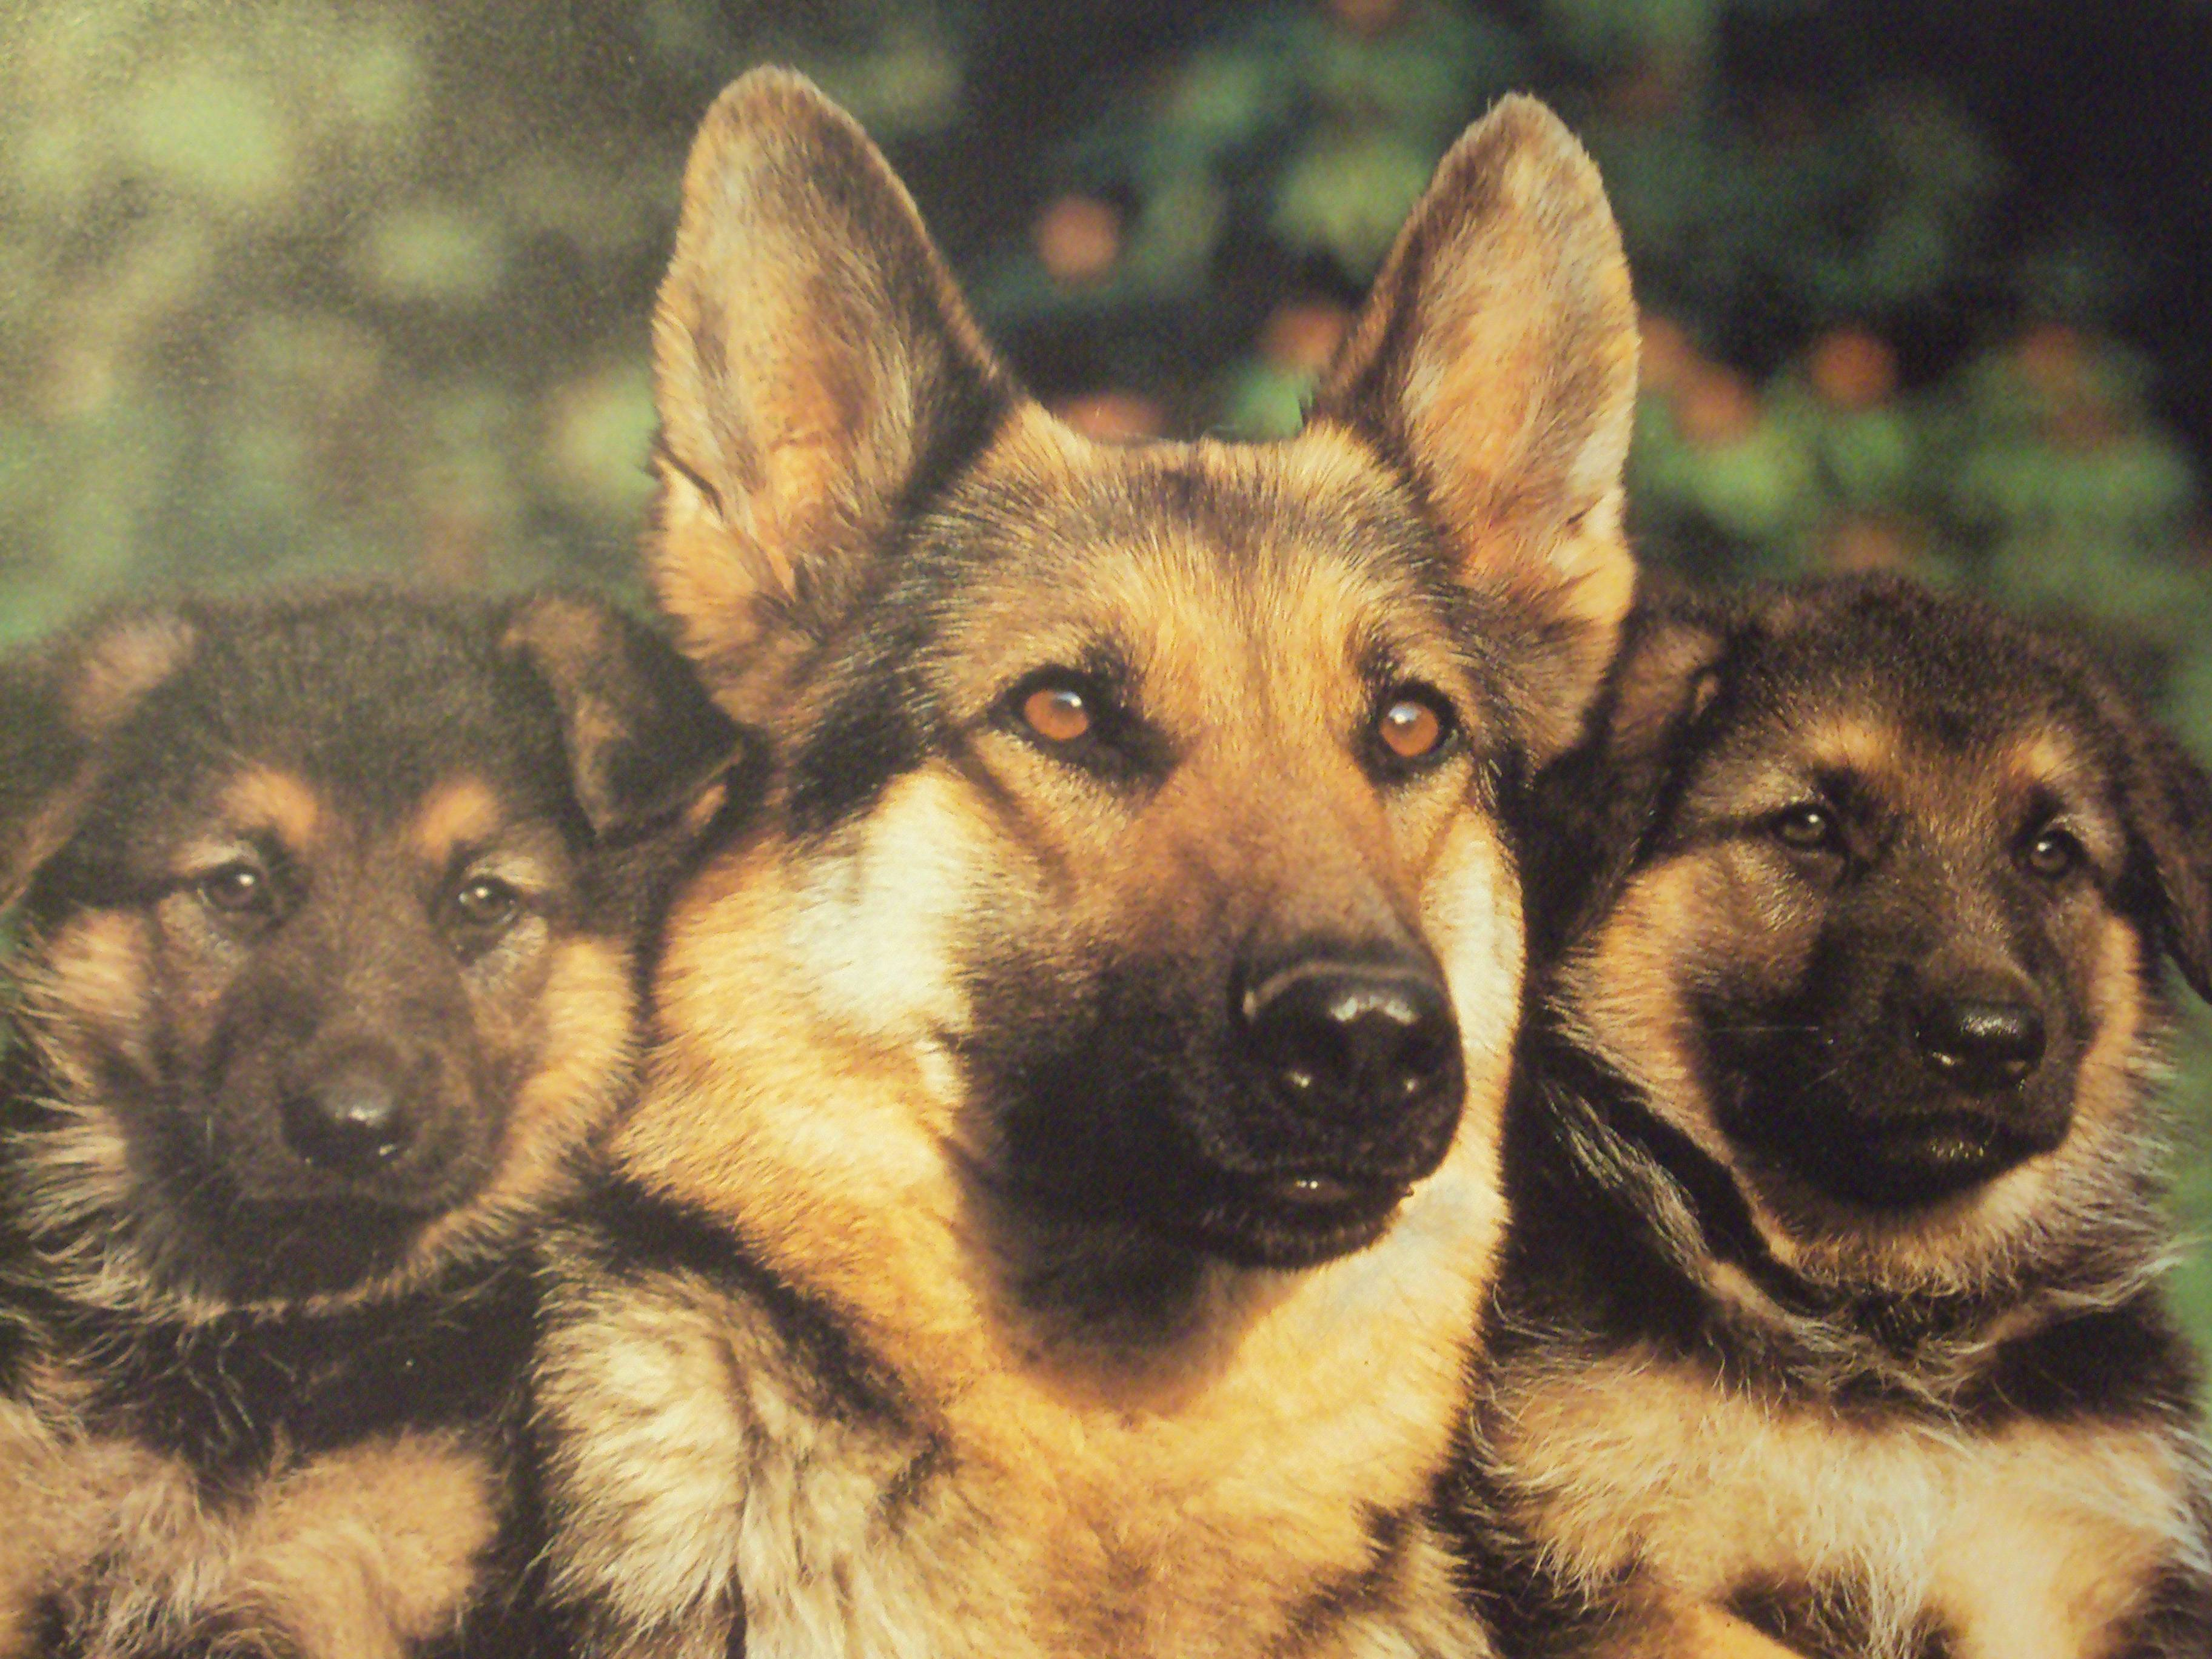 German Shepherd Desktop Wallpapers Top Free German Shepherd Desktop Backgrounds Wallpaperaccess